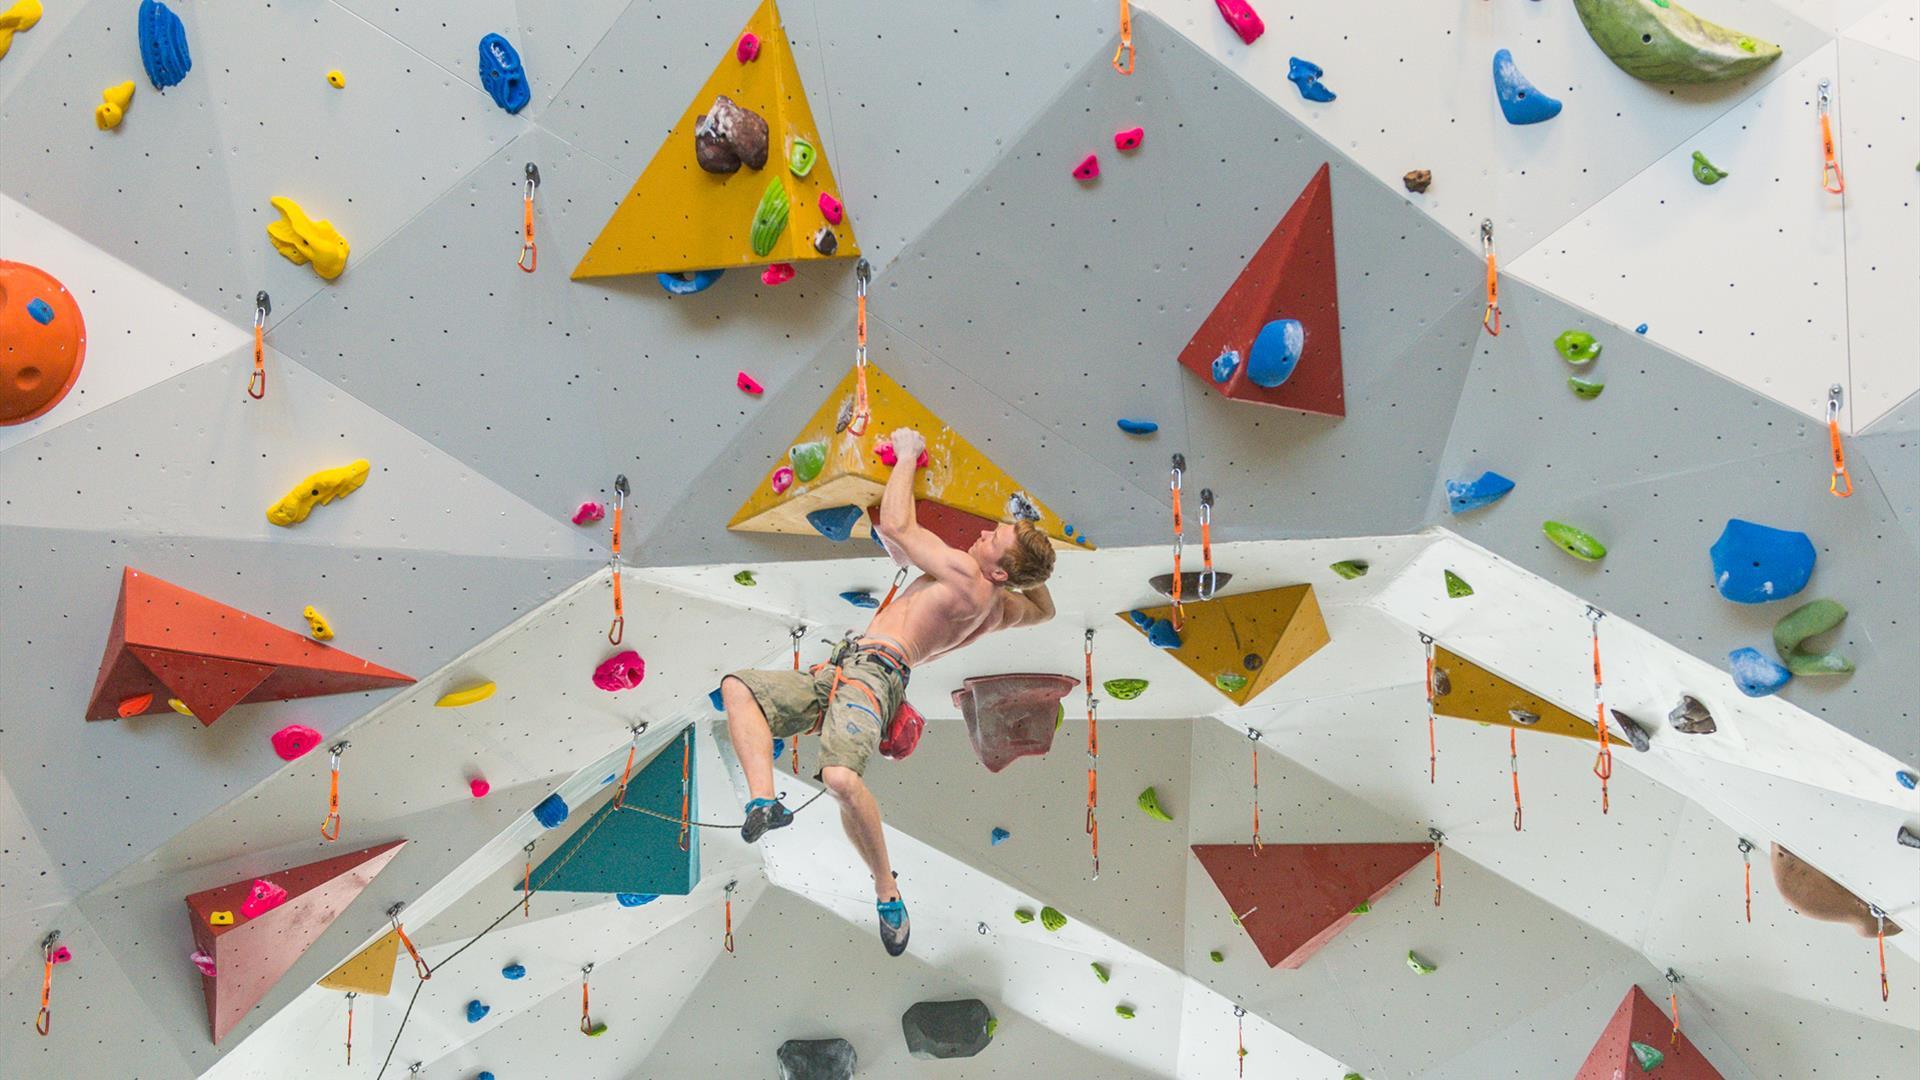 In the climbing wall at Tyrili Climbing Center